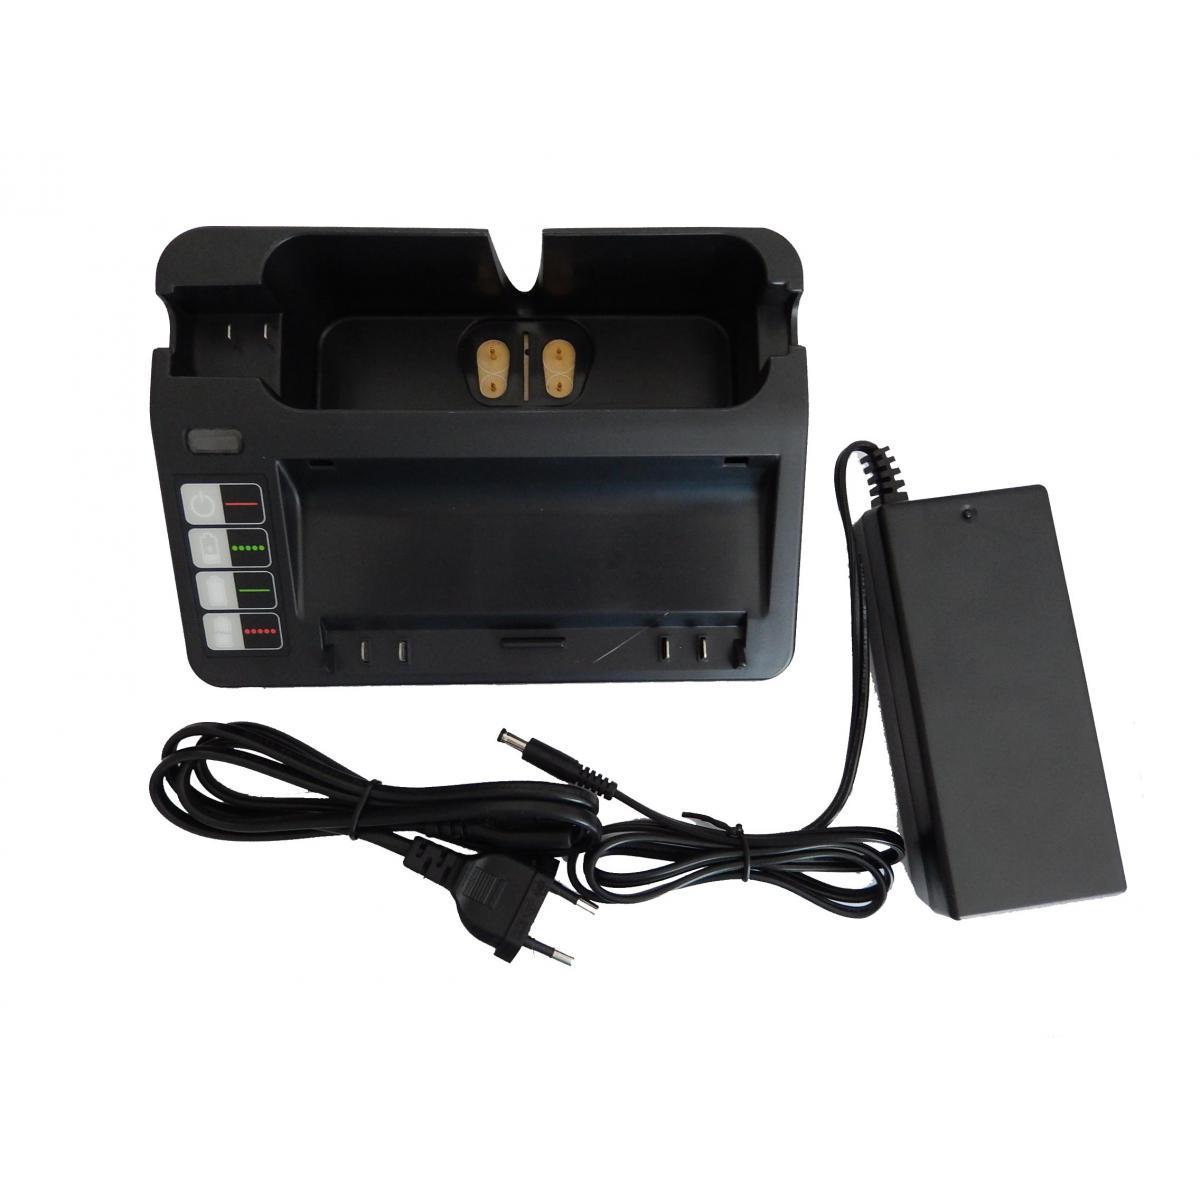 Vhbw vhbw 220V Bloc d'alimentation chargeur compatible avec Ryobi remplace 14904, BPL18151, 11700, 17373, NC-3493-919, 11702